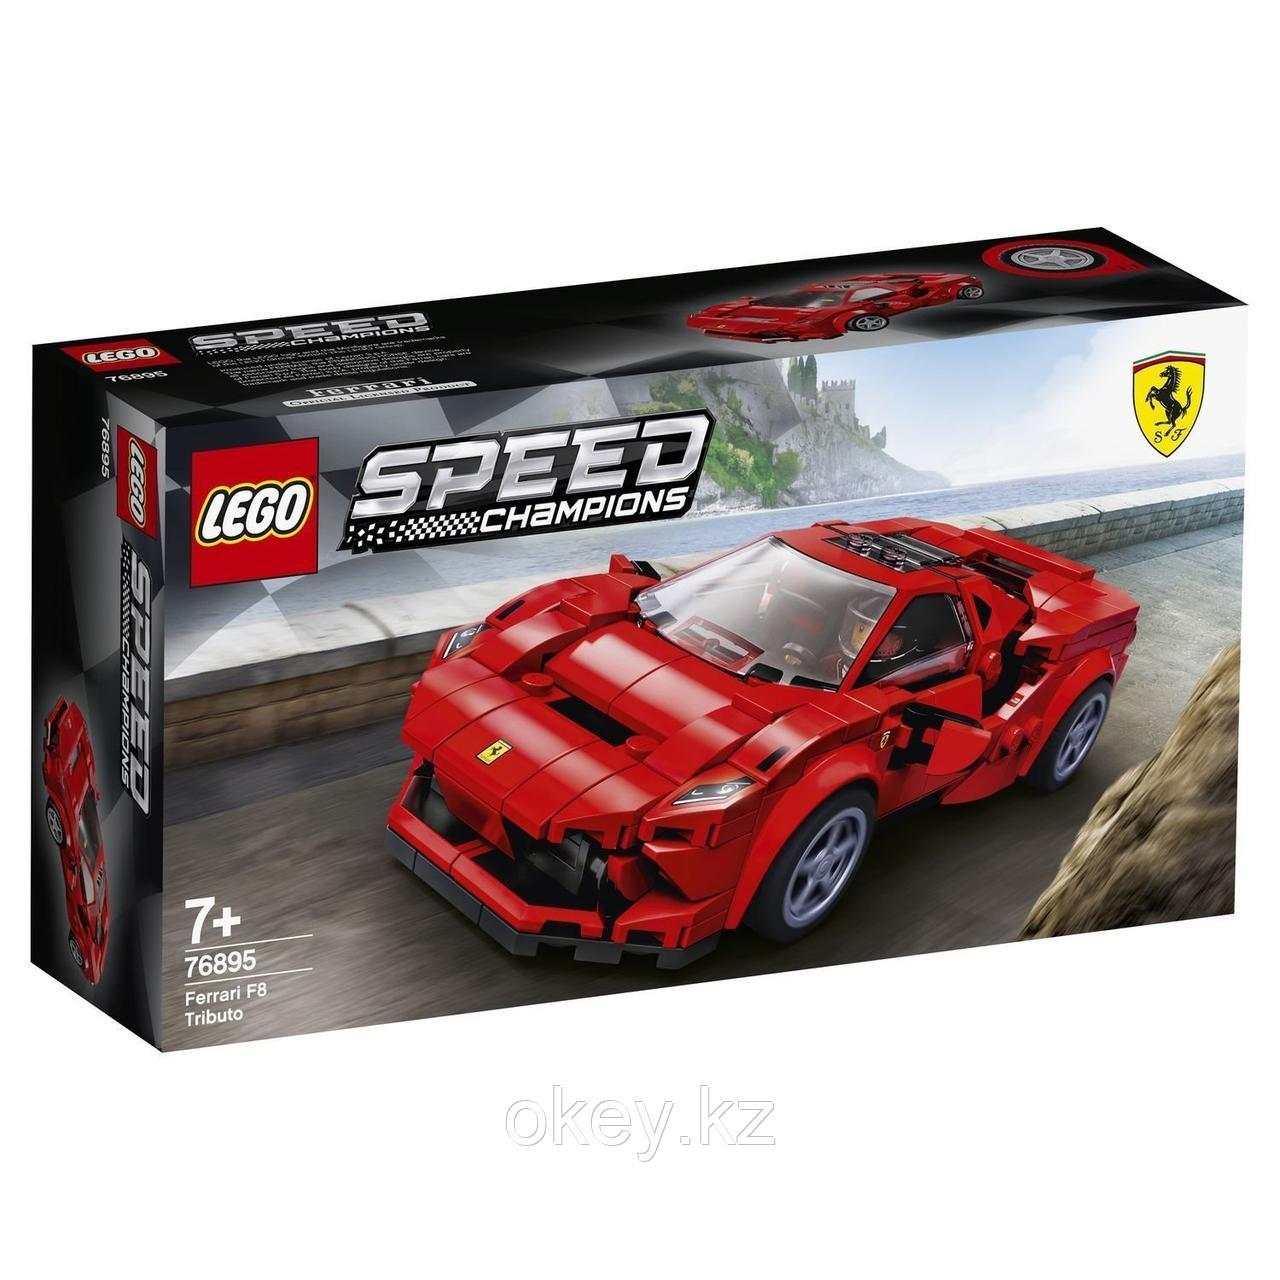 LEGO Speed Champions: Ferrari F8 Tributo 76895 - фото 1